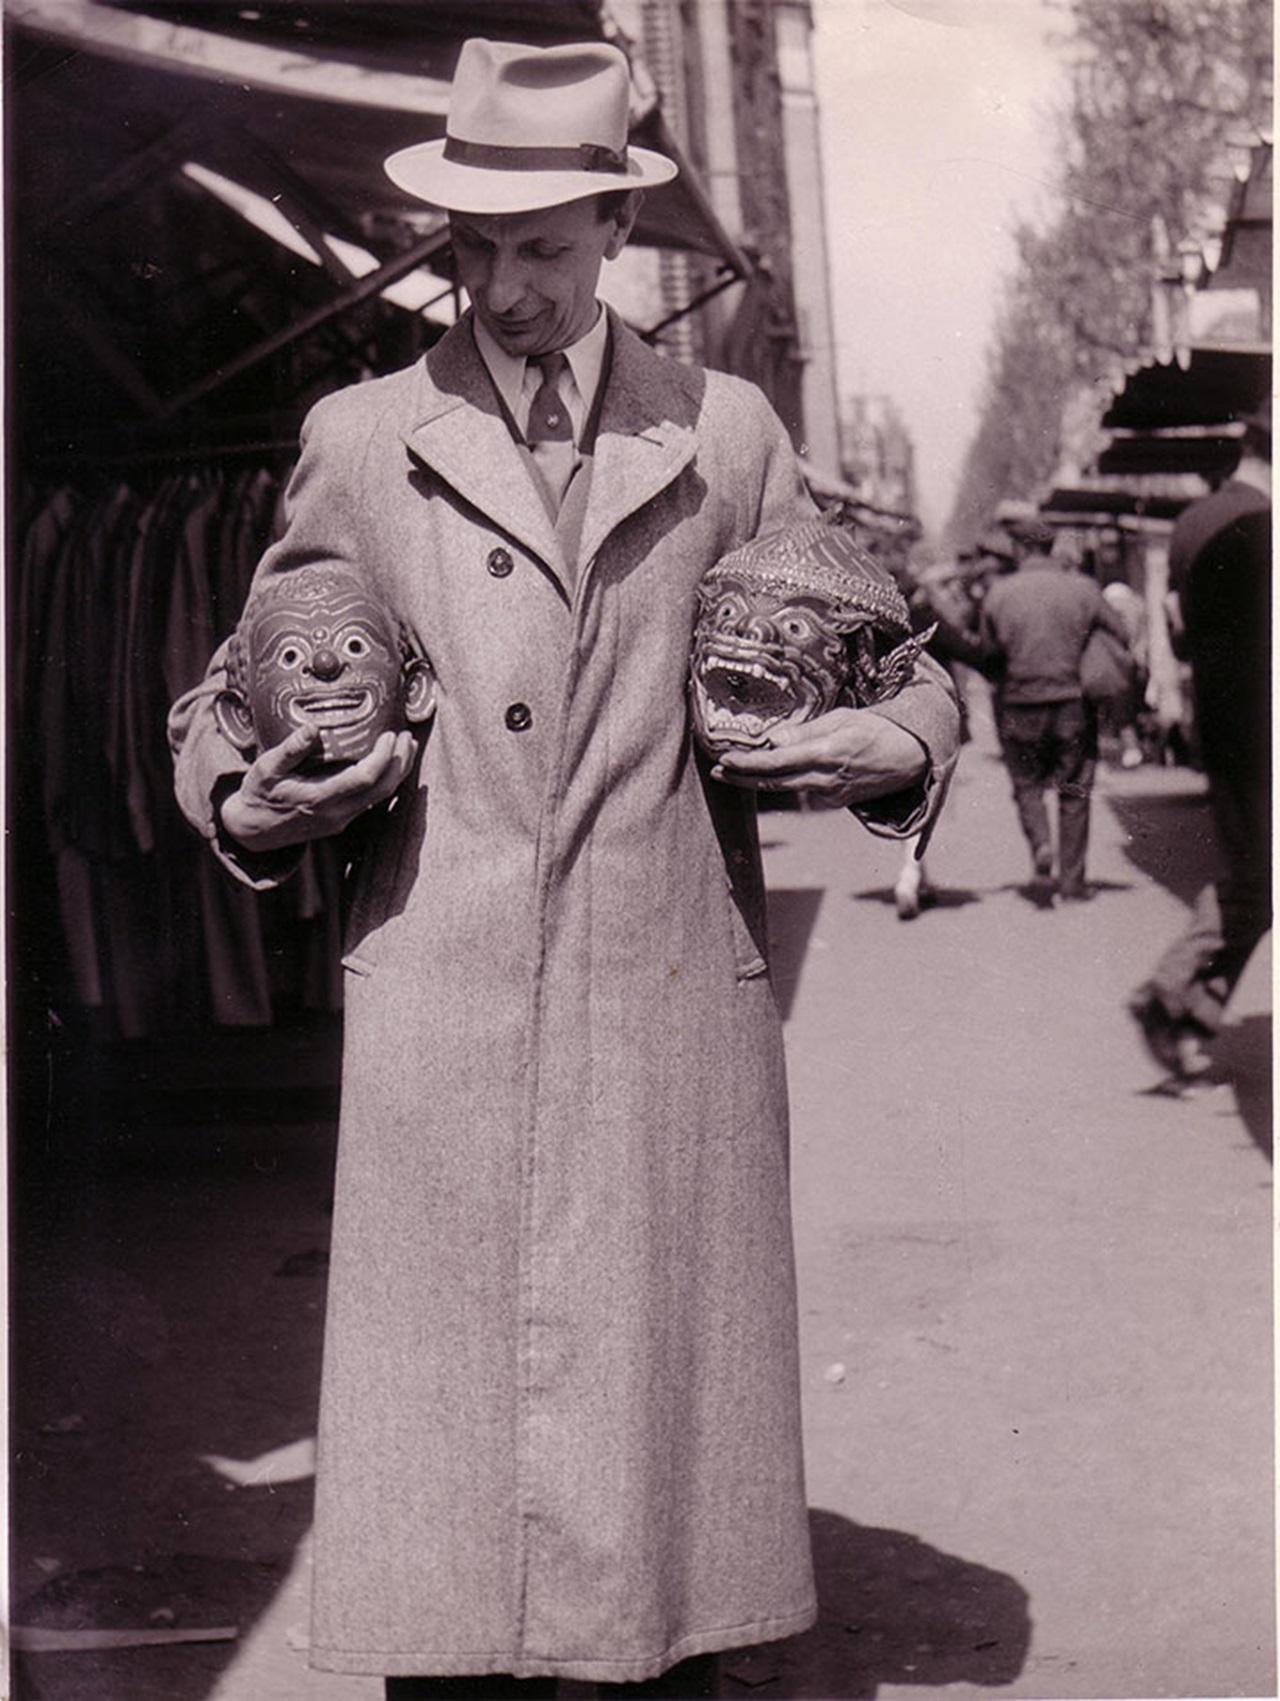 Matthias Lemaire, circa 1950. Photo courtesy of Finette Lemaire.